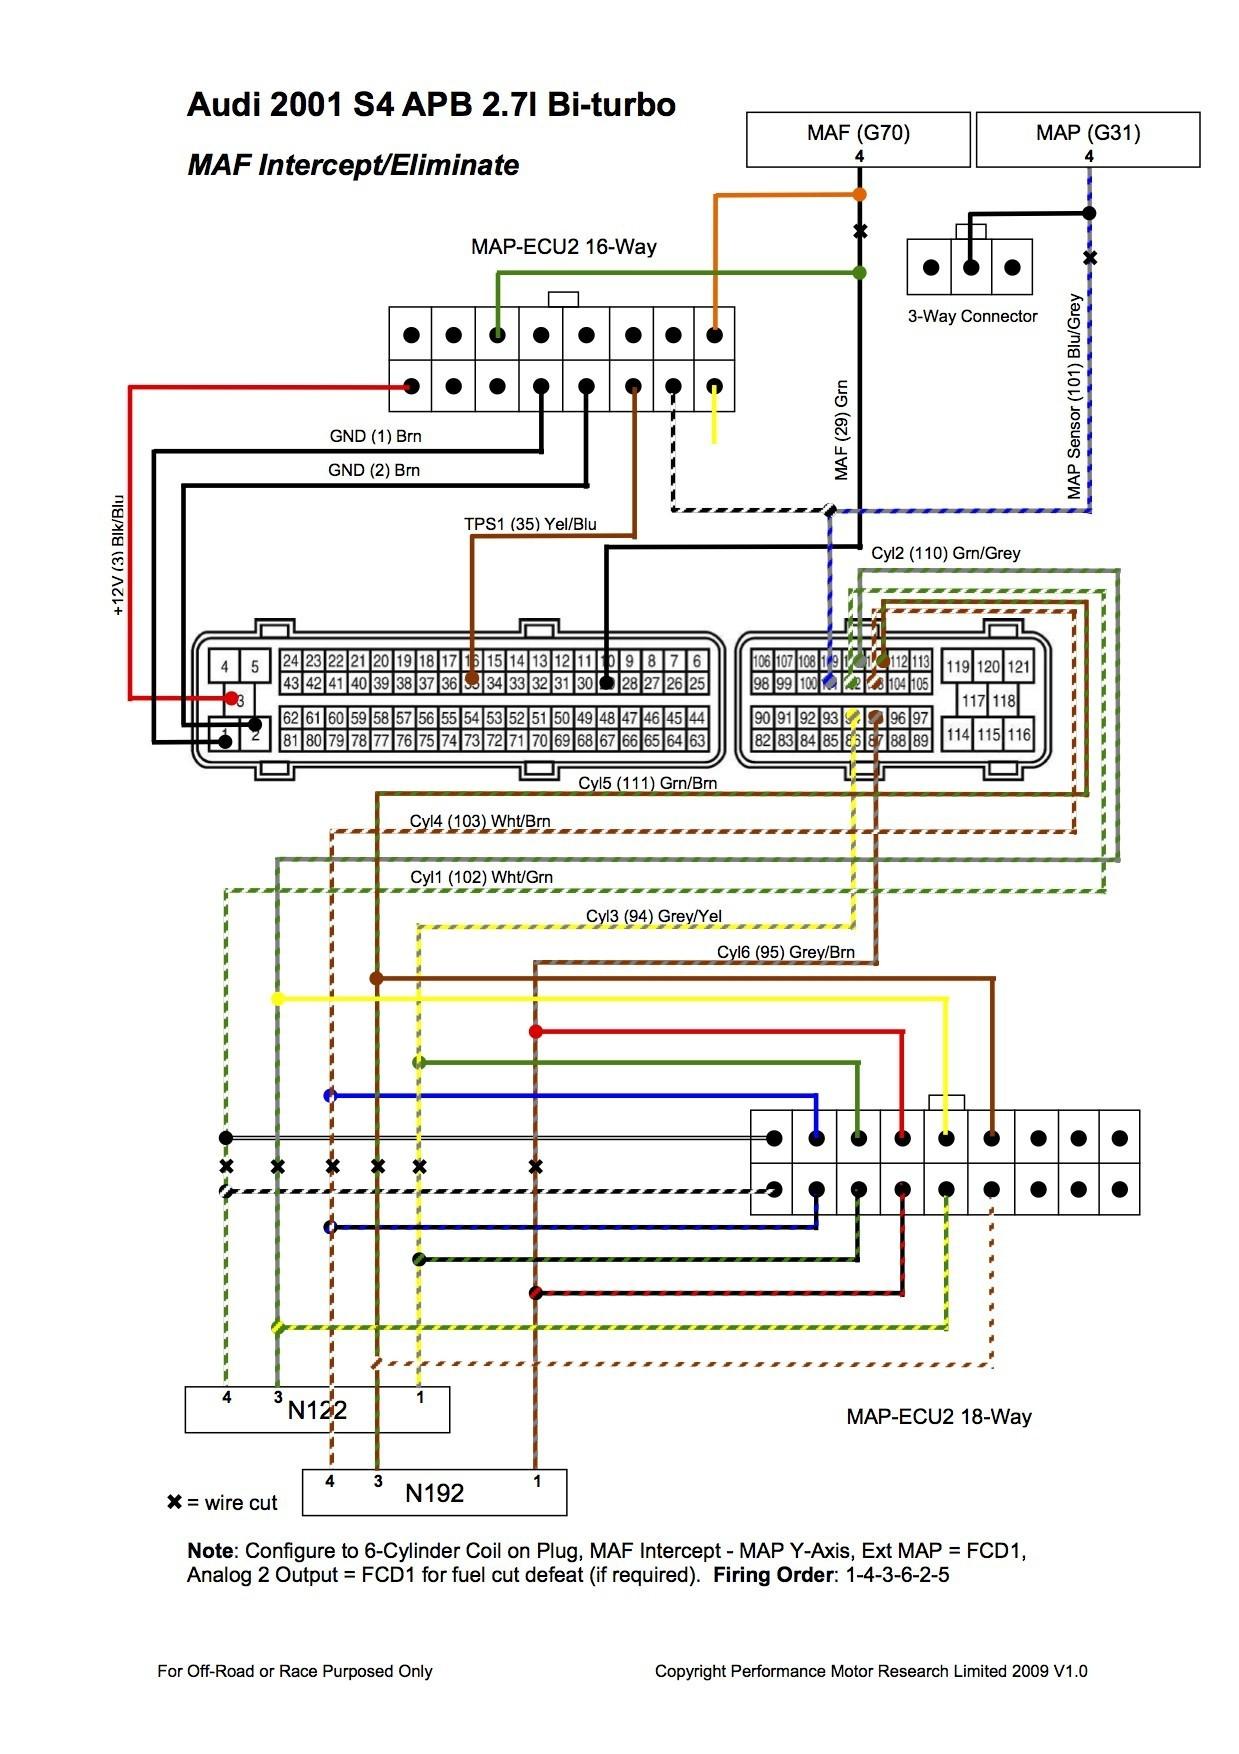 09 Audi Q7 Wiring Diagram | Wiring Diagrams Exact phone | Speaker Wire Diagram 1985 Dodge |  | wiring diagram library